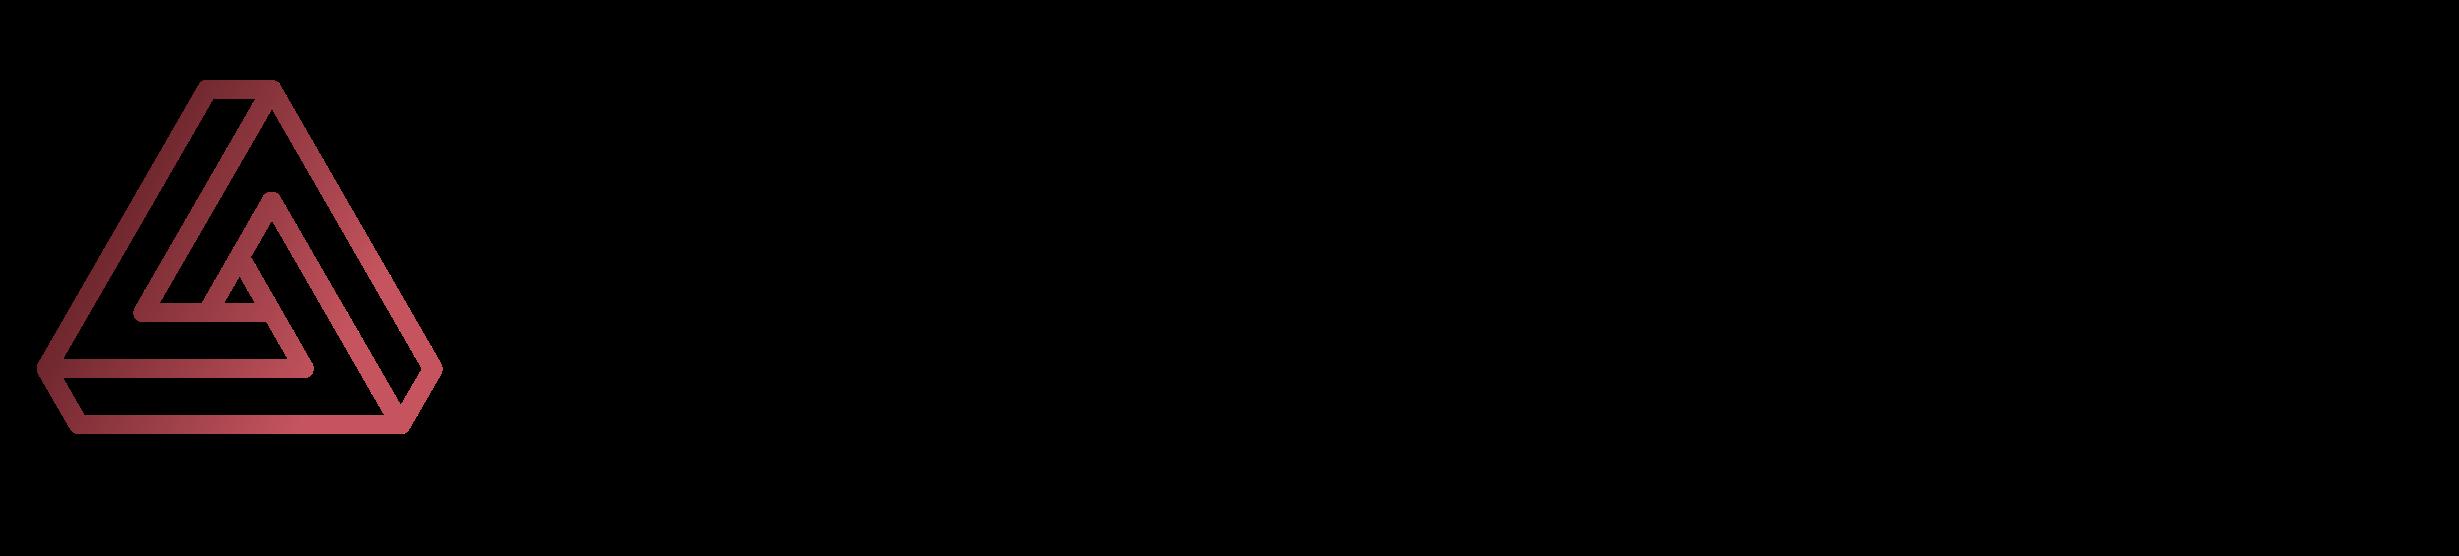 Trublutint